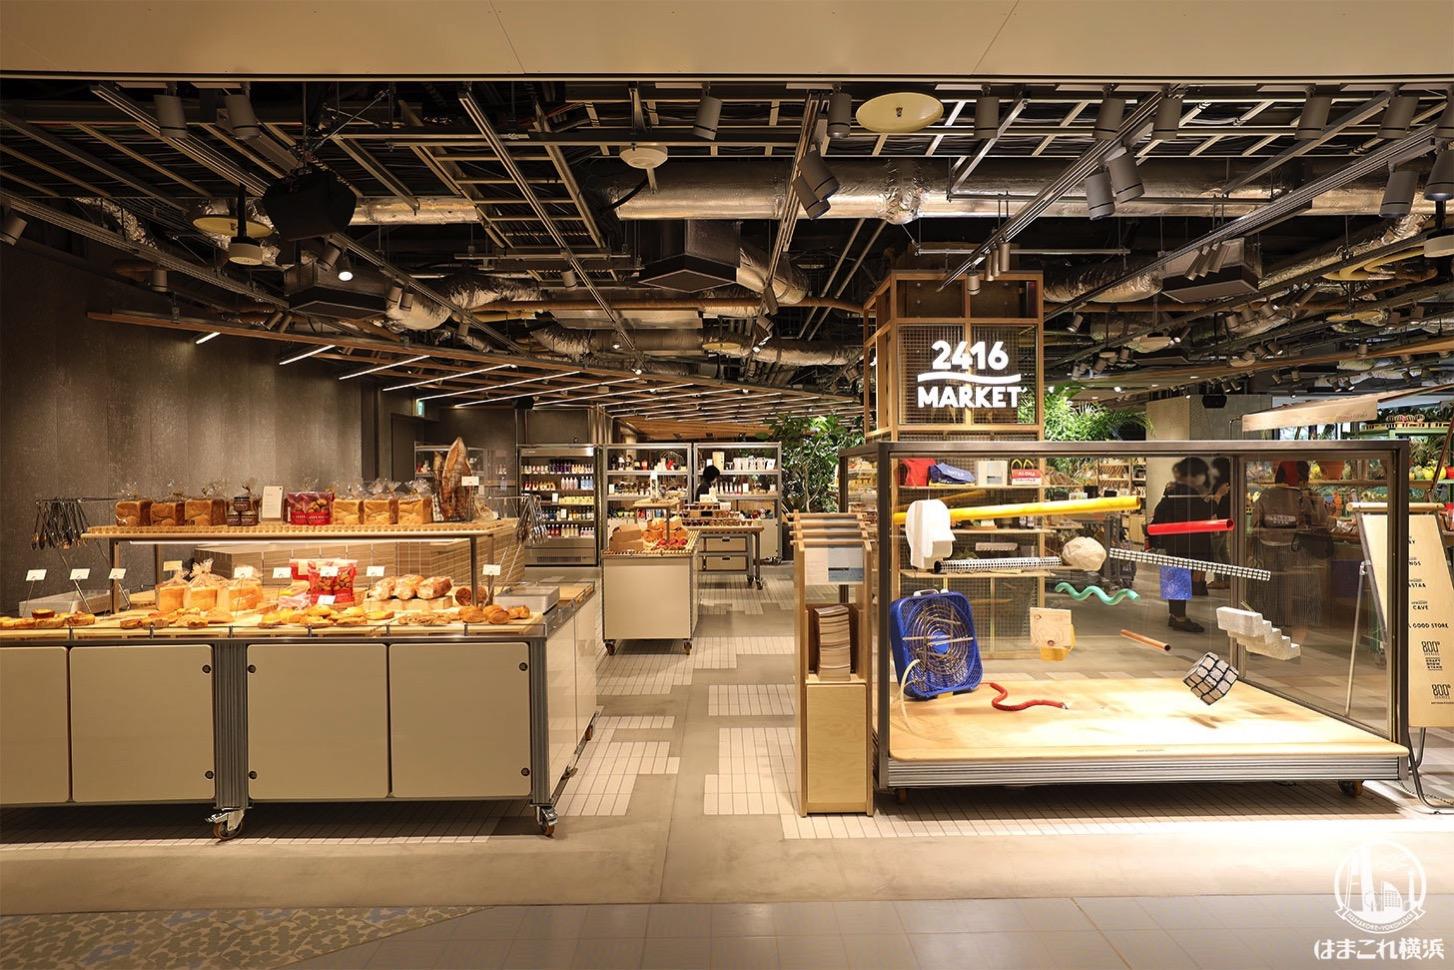 2416MARKETにレストランやベーカリーなど神奈川の魅力集結、ニュウマン横浜